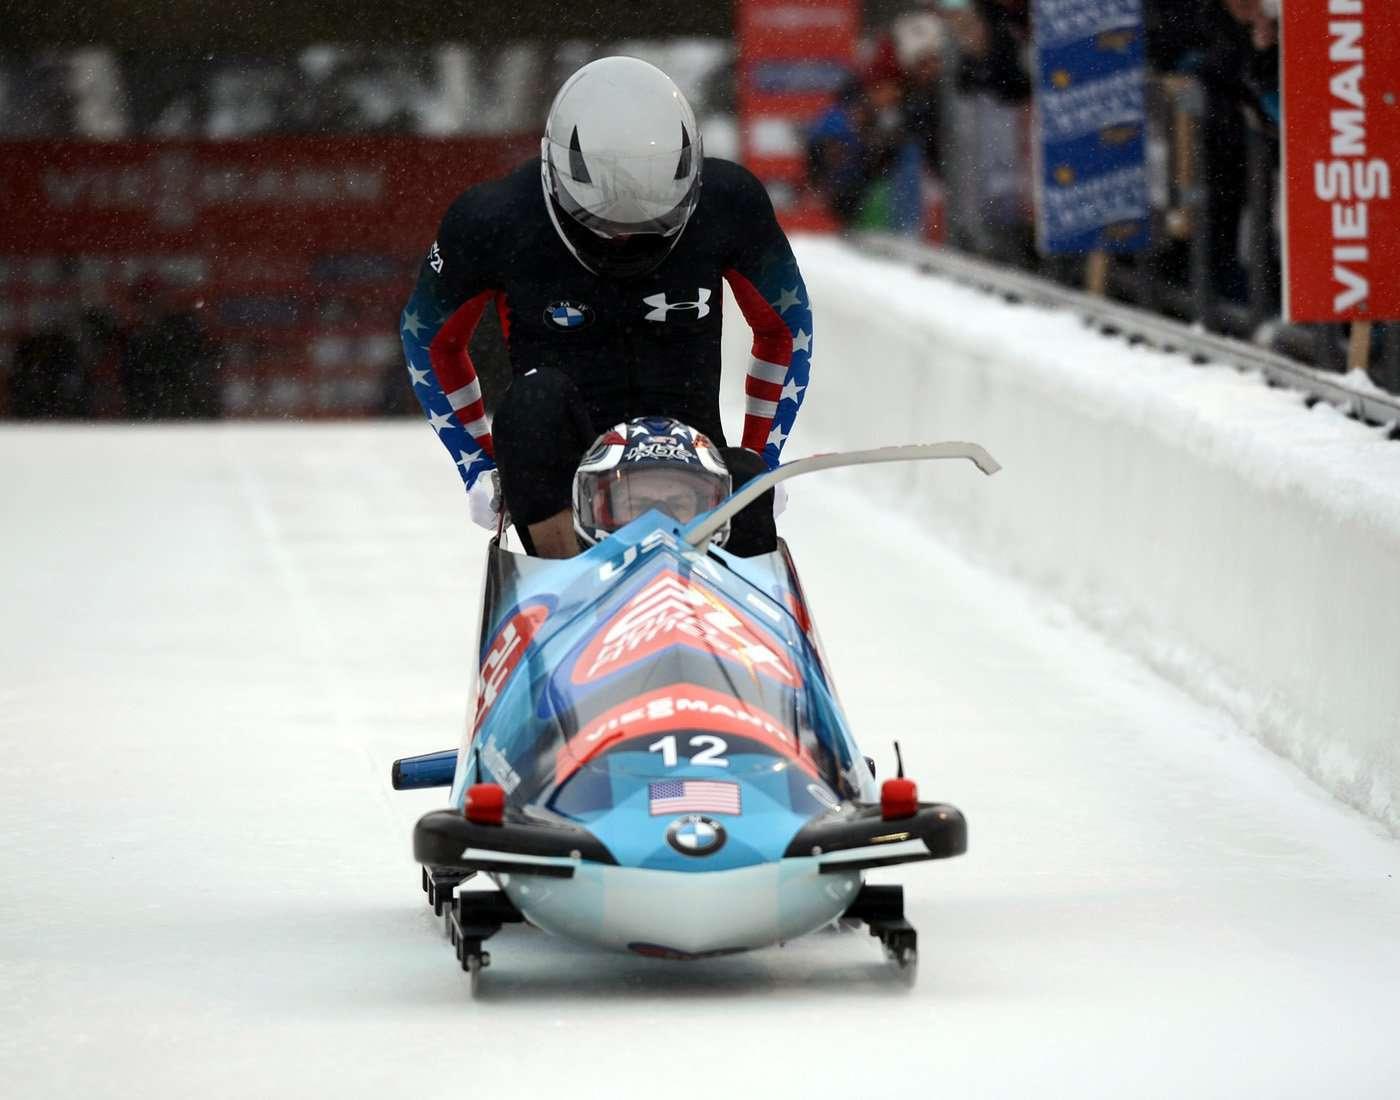 https://sportsmatik.com/uploads/matik-sports-corner/matik-know-how/bobsled_1493722273_73776.jpg